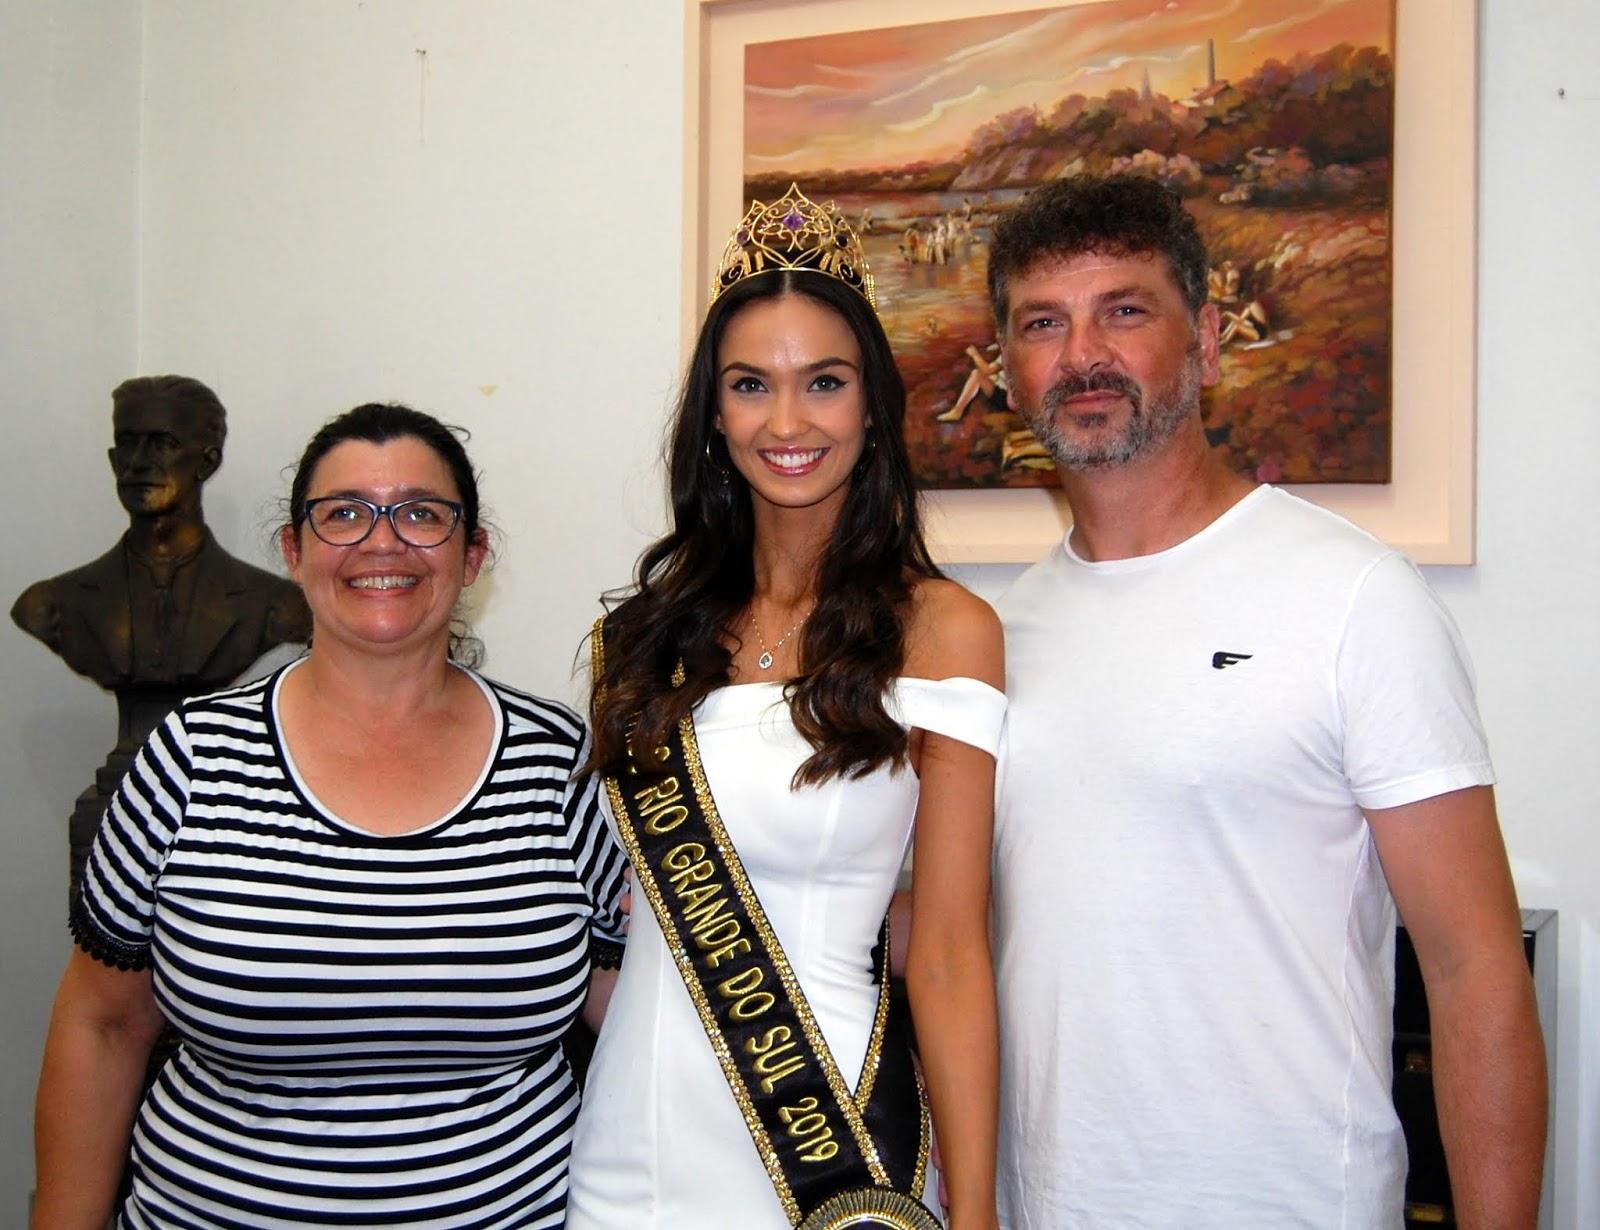 bianca scheren, top 5 de miss brasil universo 2019. - Página 5 Dsc_0020